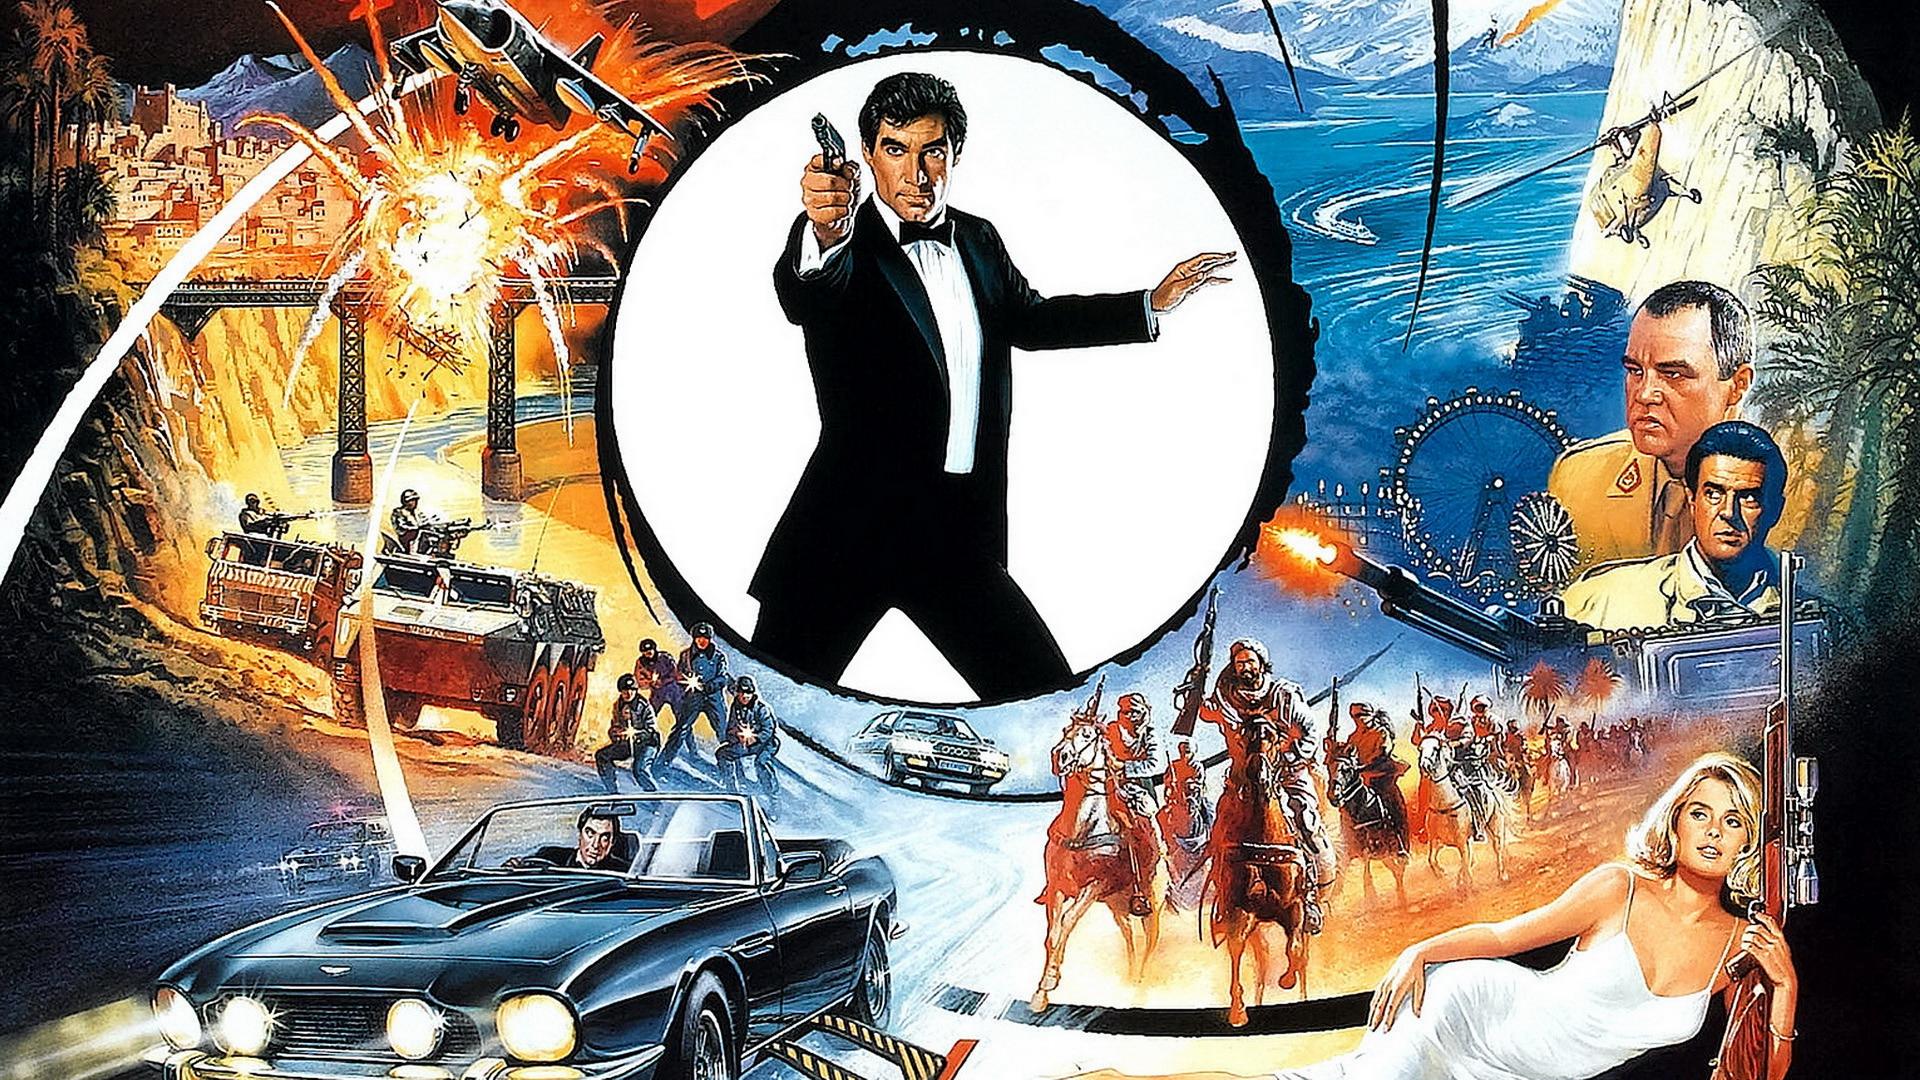 James Bond Wallpaper Hd 1080p 12 HD Desktop Wallpapers 1920x1080